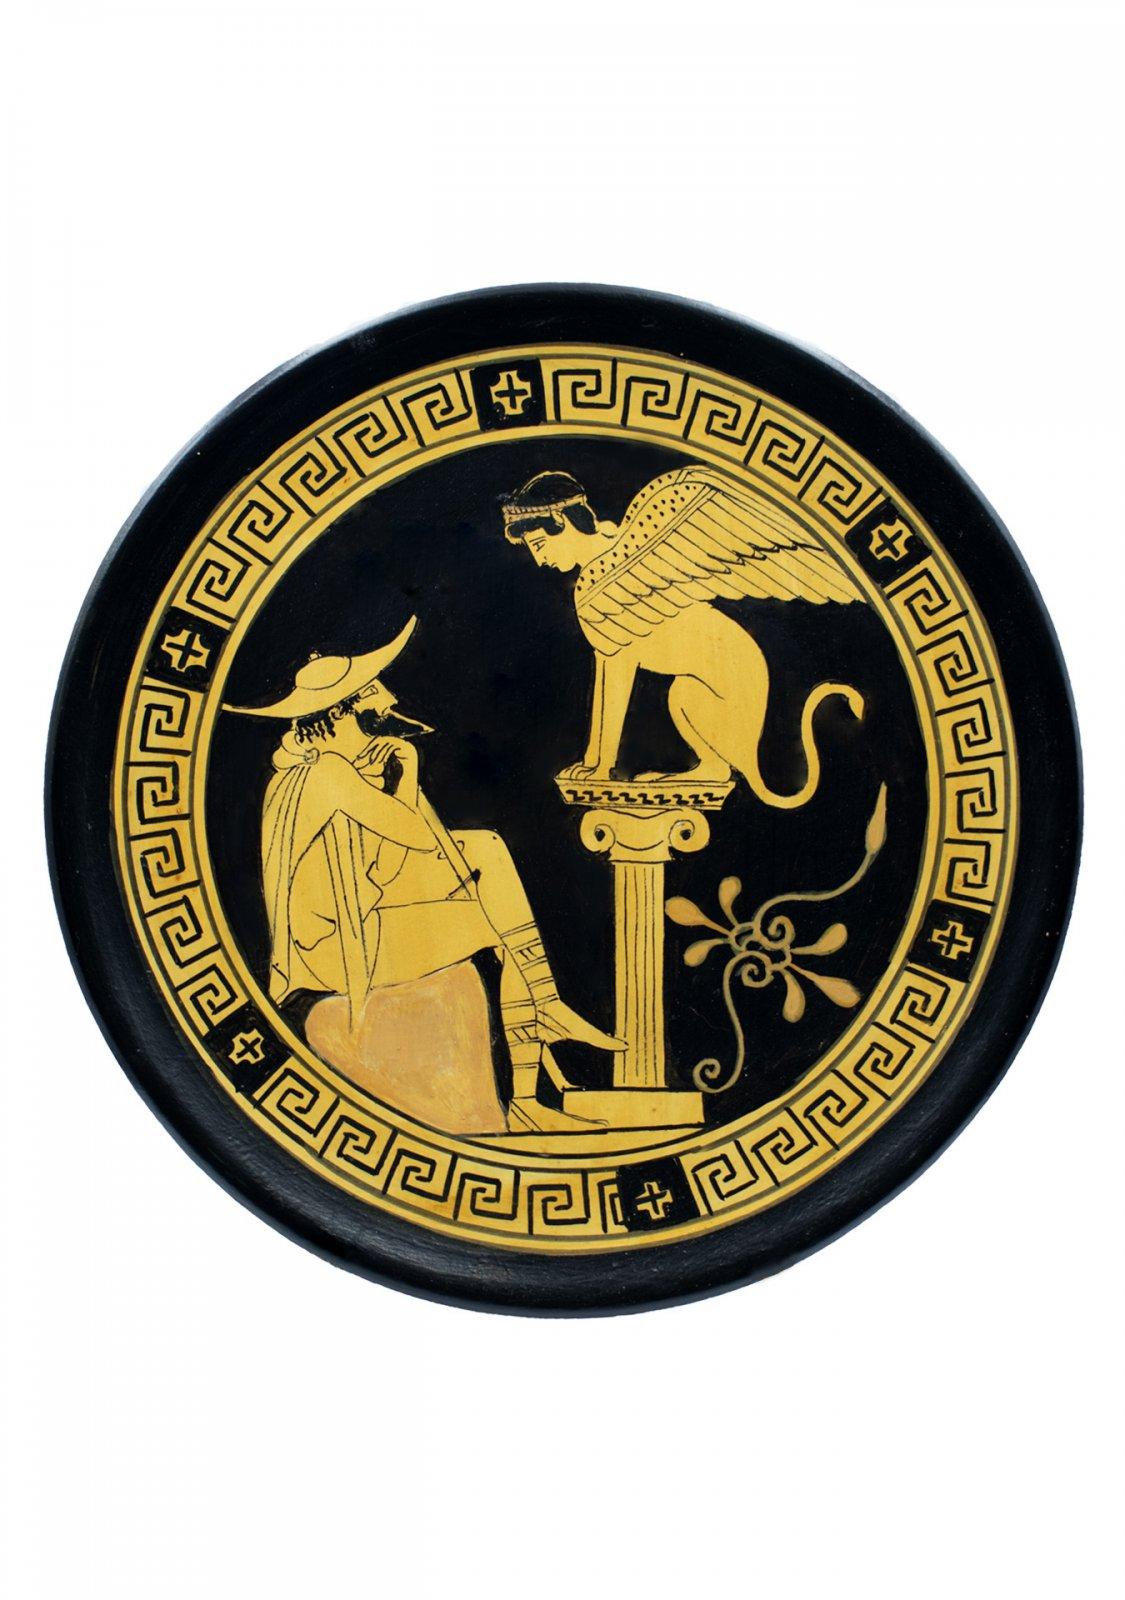 Classical Greek ceramic plate depicting Oedipus and Sphinx